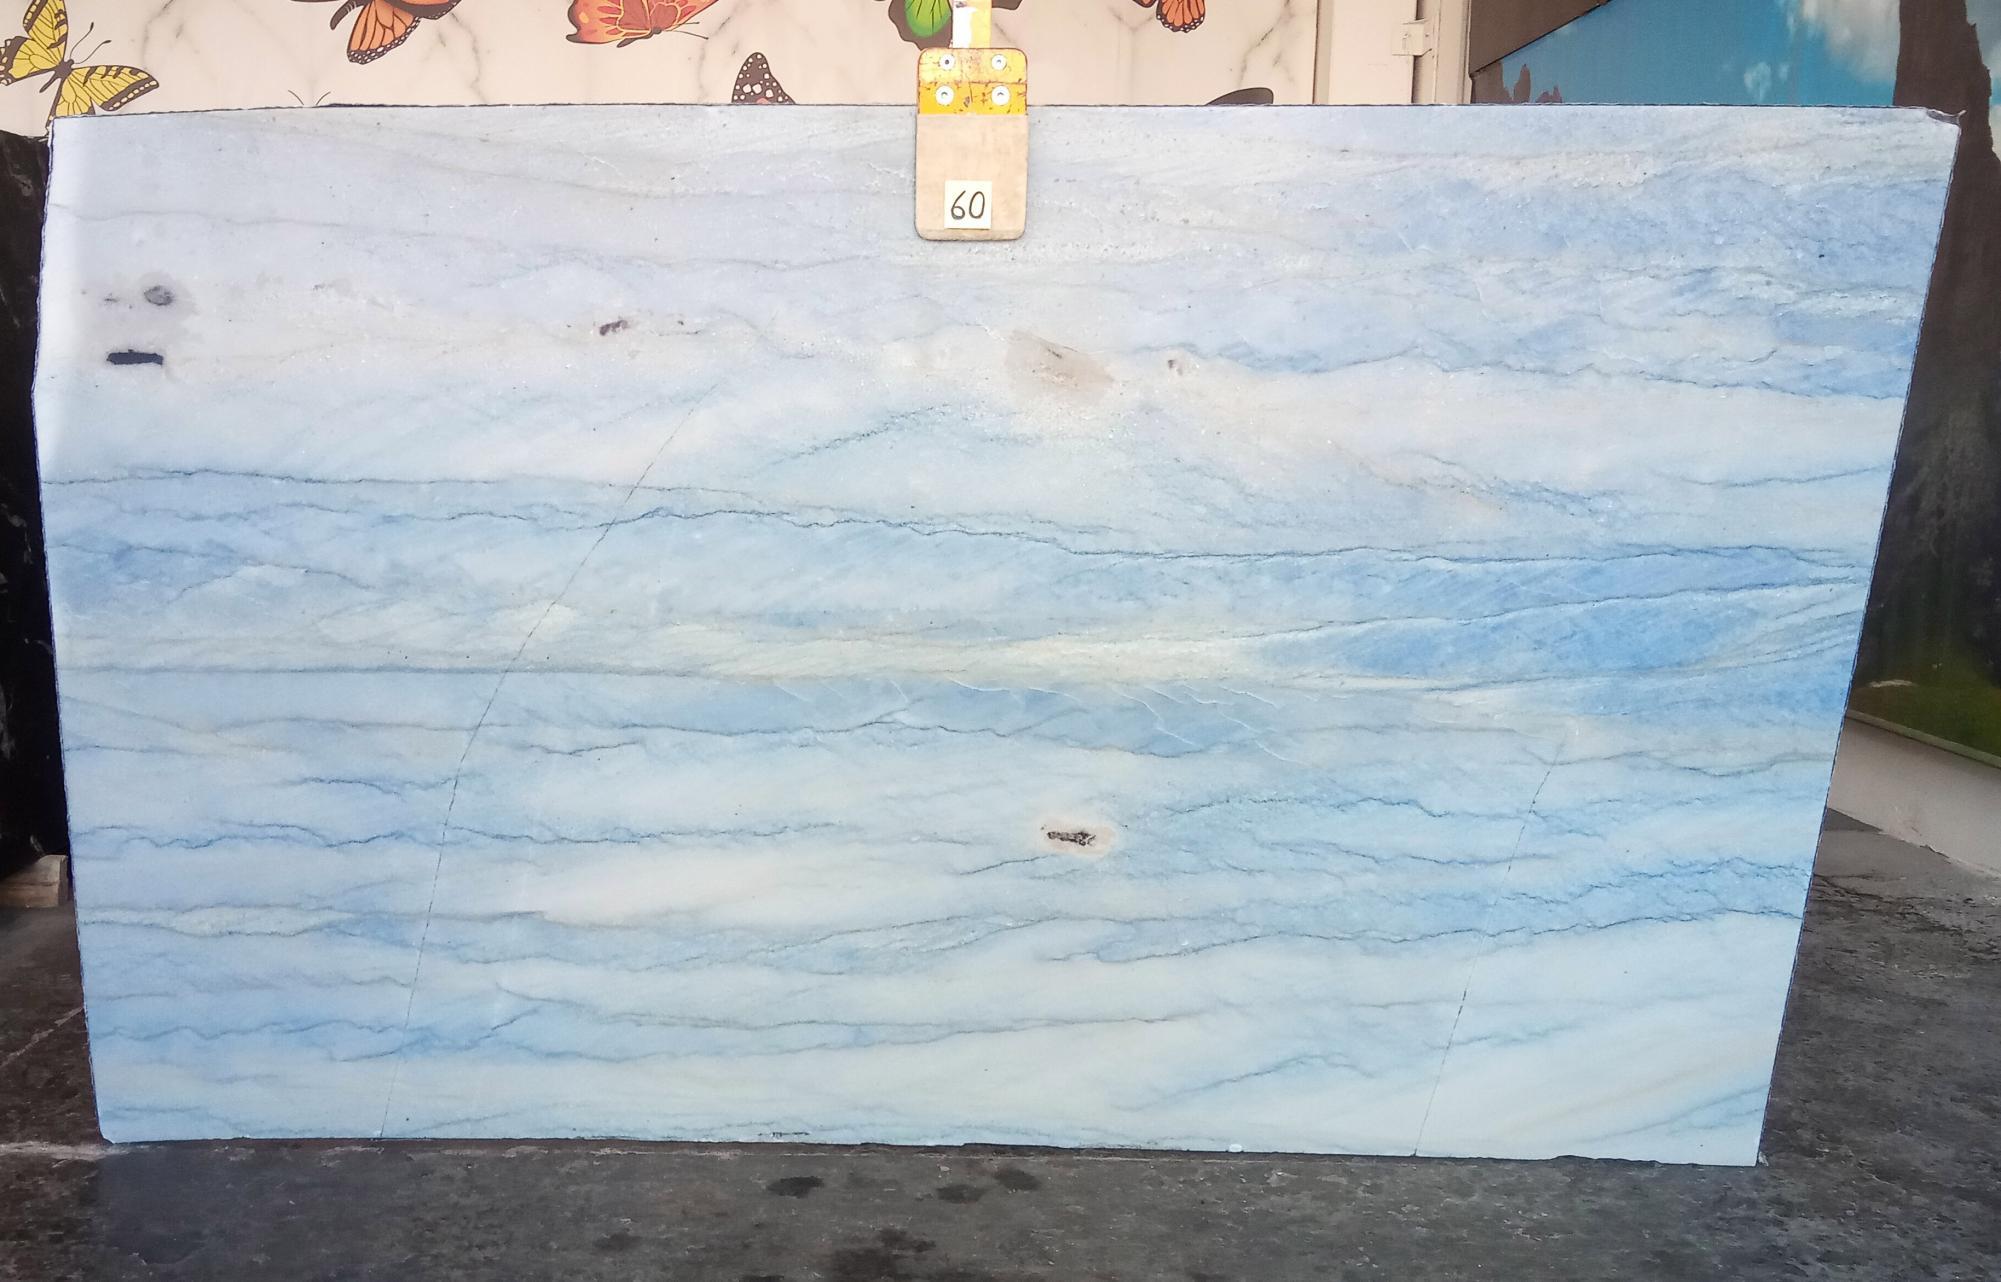 AZUL MAKAUBA Suministro Veneto (Italia) de planchas pulidas en mármol natural Z0191 , Slab #60